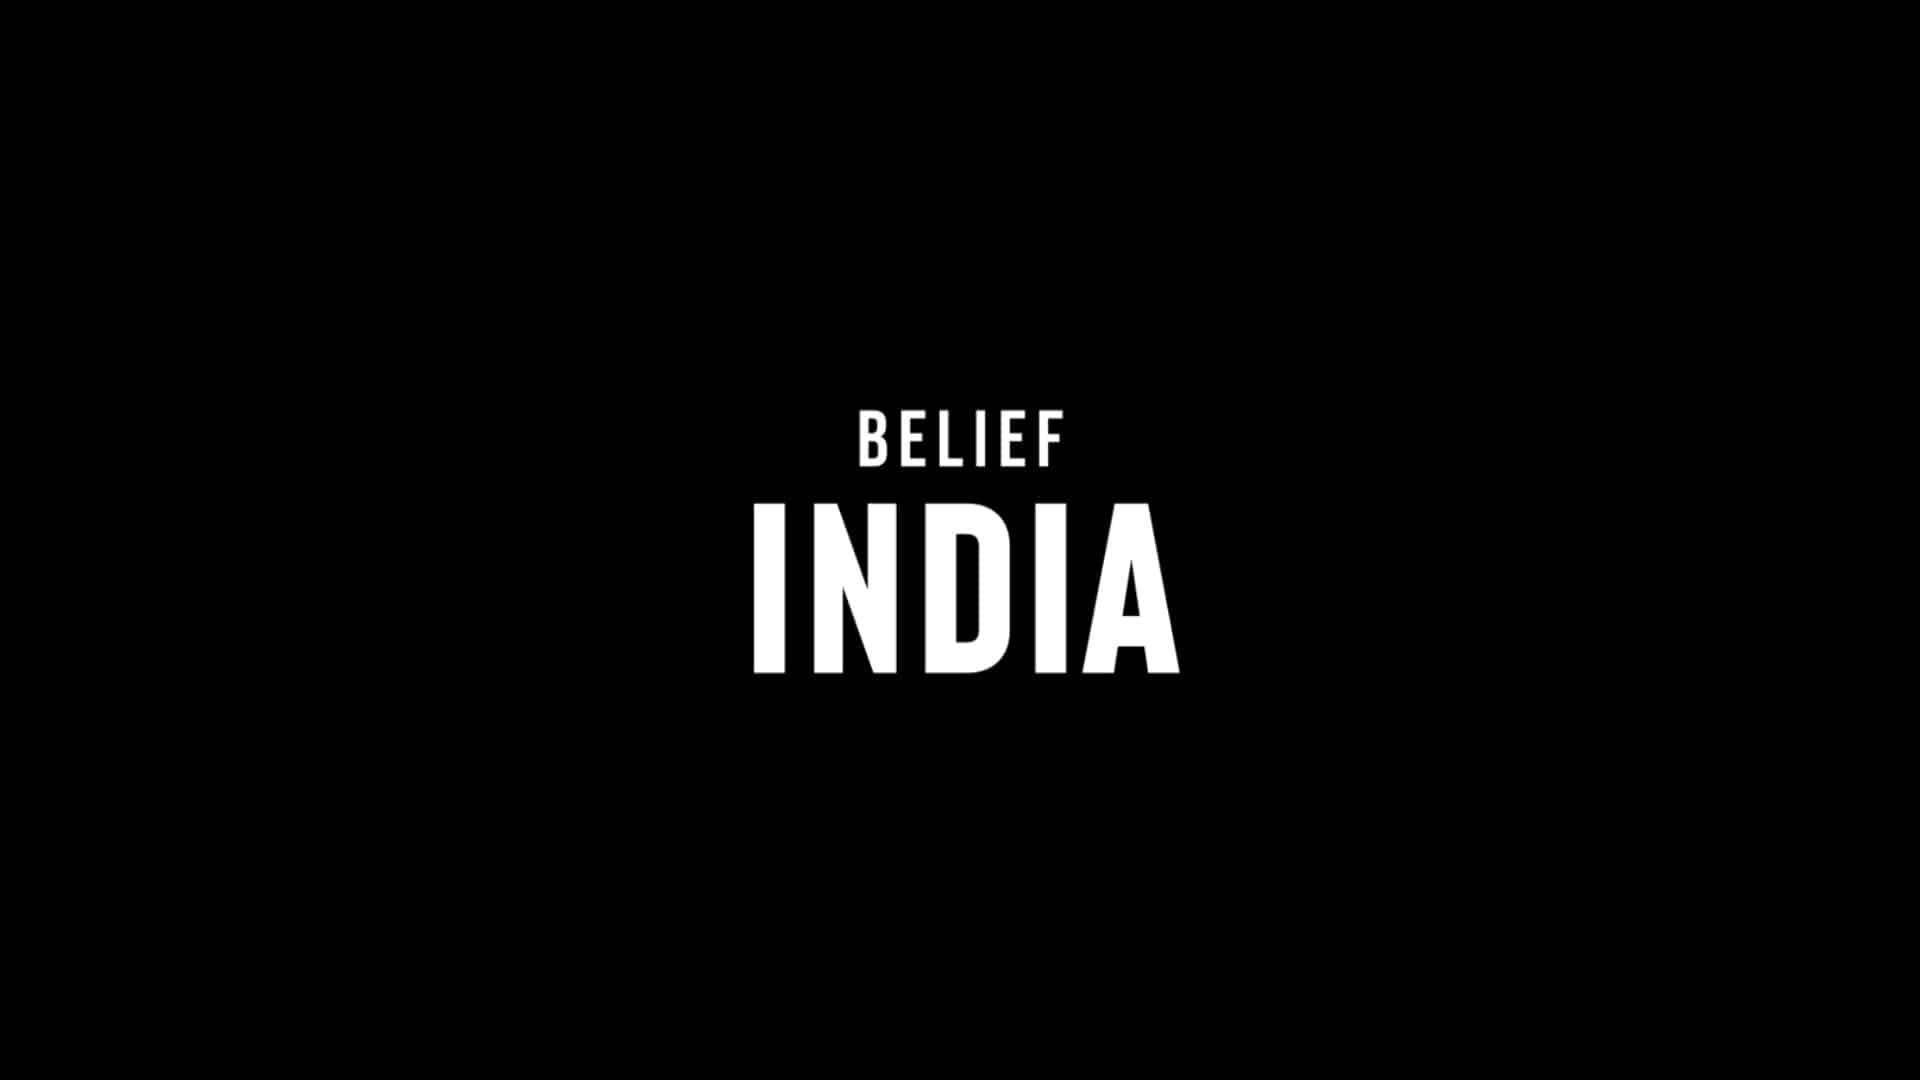 bELieF - India (beliefmusiq)   #india #indian #bharat #bhartiya #bharatiya #hindustan #hindustani #watan #desh #nation #nationalanthem #republicday #independenceday #gandhijayanti #gandhijayanthi #atmanirbhar #aatmanirbhar #atmanirbharbharat #aatmanirbharbharat #swades #swadeshi #vocalforlocal #narendramodi #pmmodi #galwan #galwaan #lac #lacstandoff #indiachinastandoff #hindicheenibyebye #boycottchina #boycottchinese #banchina #banchinese #banchineseapps #chineseappsban #digitalstrike #surgicalstrike #airstrike #doklam #doklamstandoff #kashmirissue #kashmir #article370 #akhandbharat